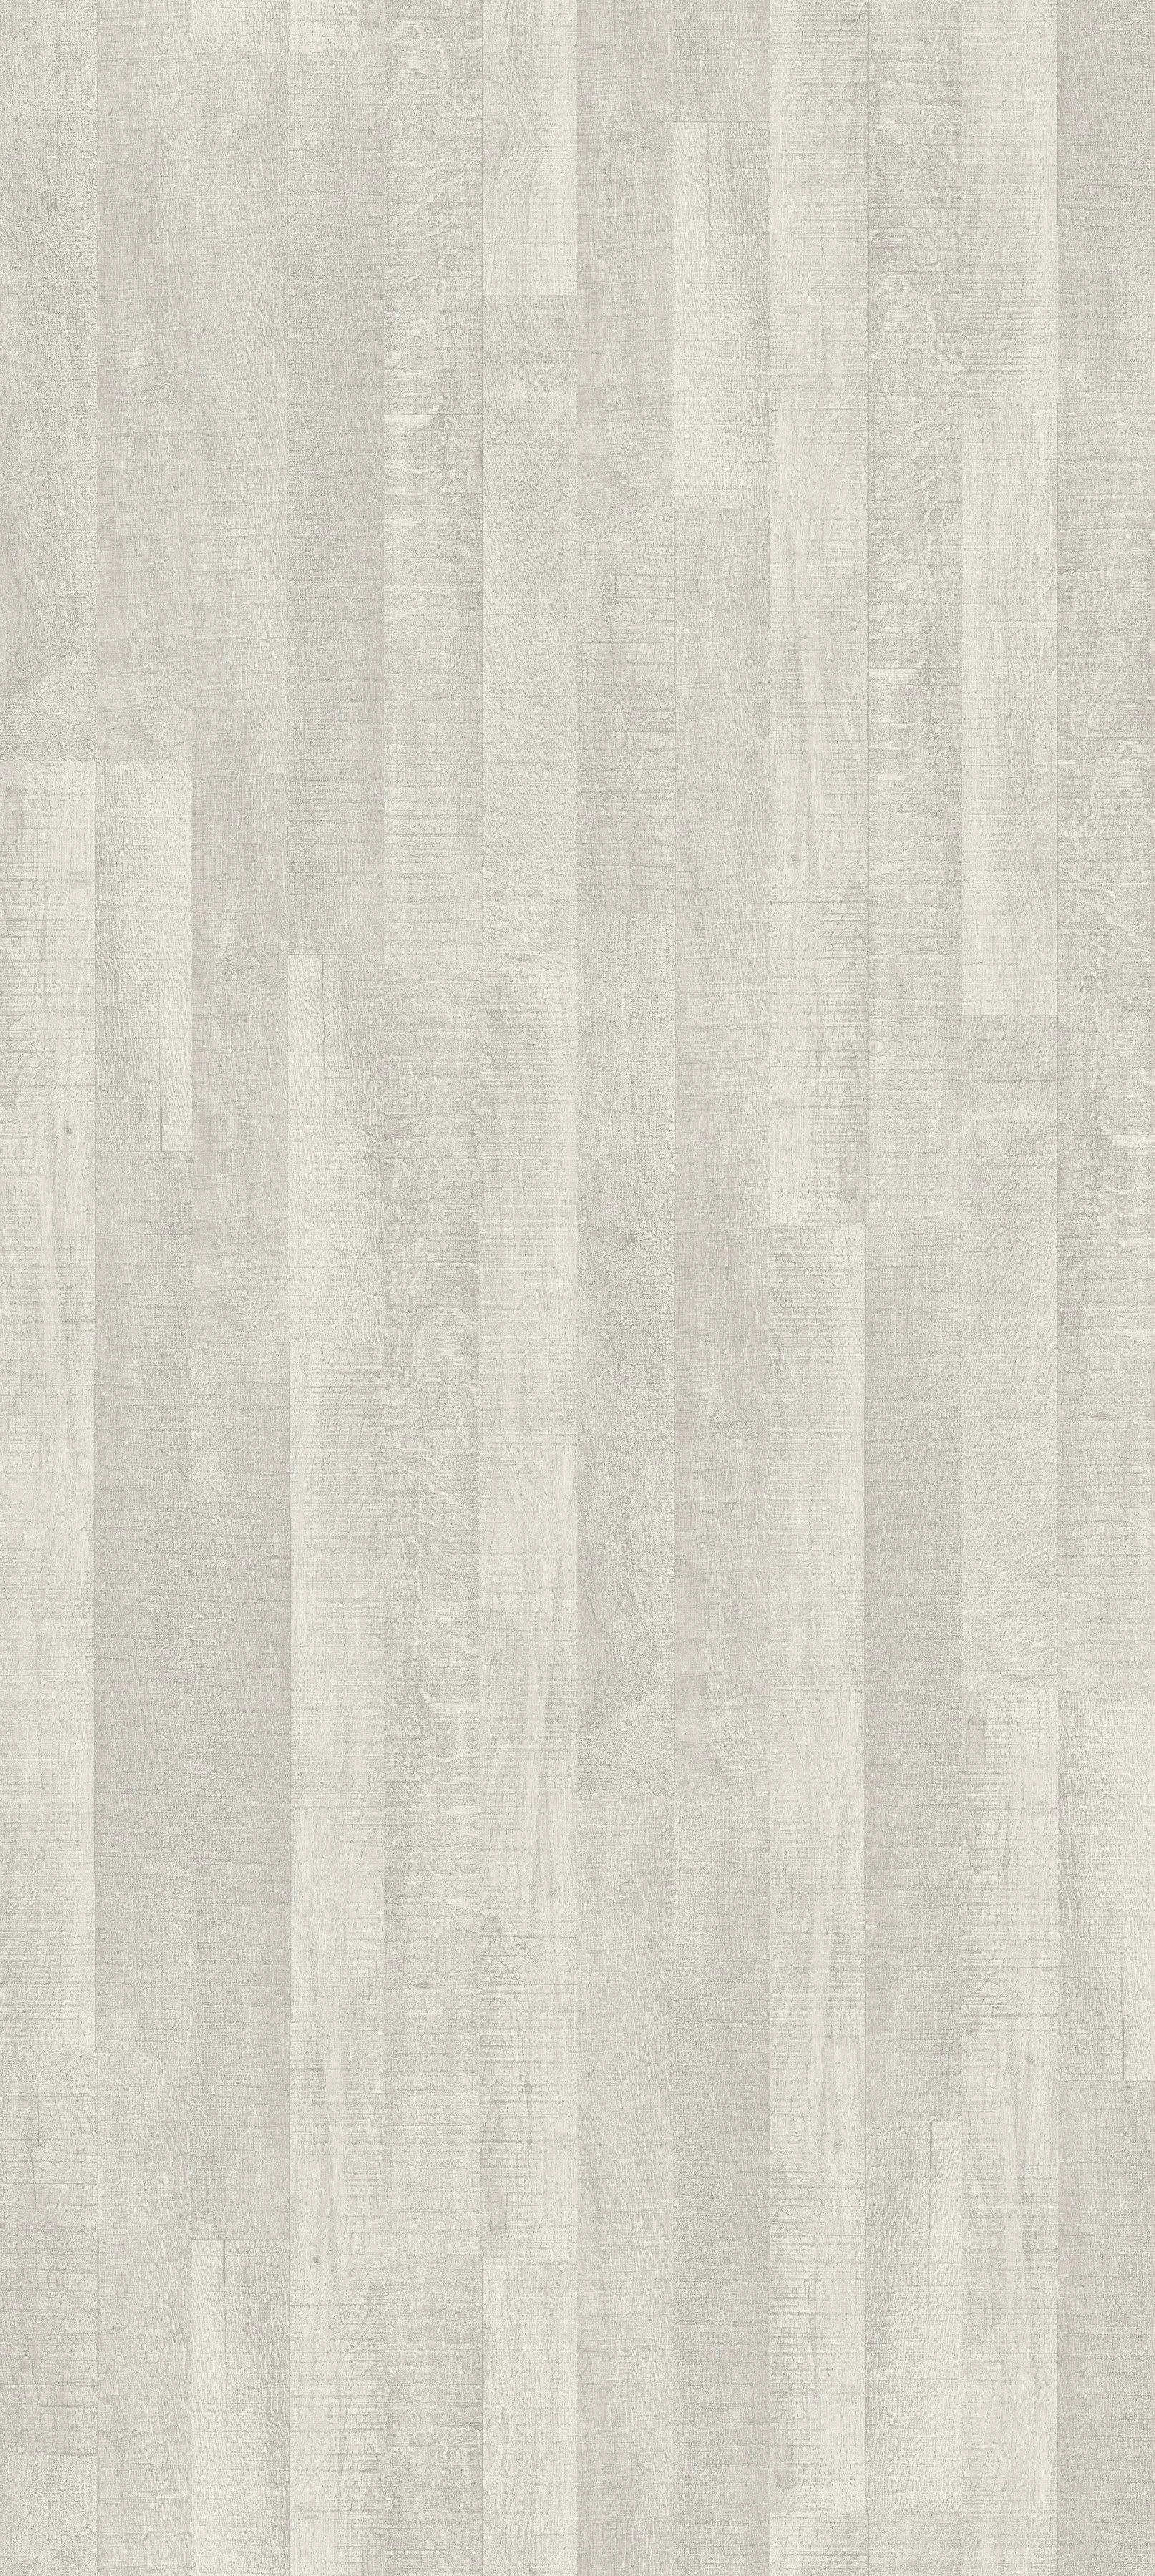 PARADOR Laminat »Basic 200 - Eiche weiß«, 194 x 1285 mm